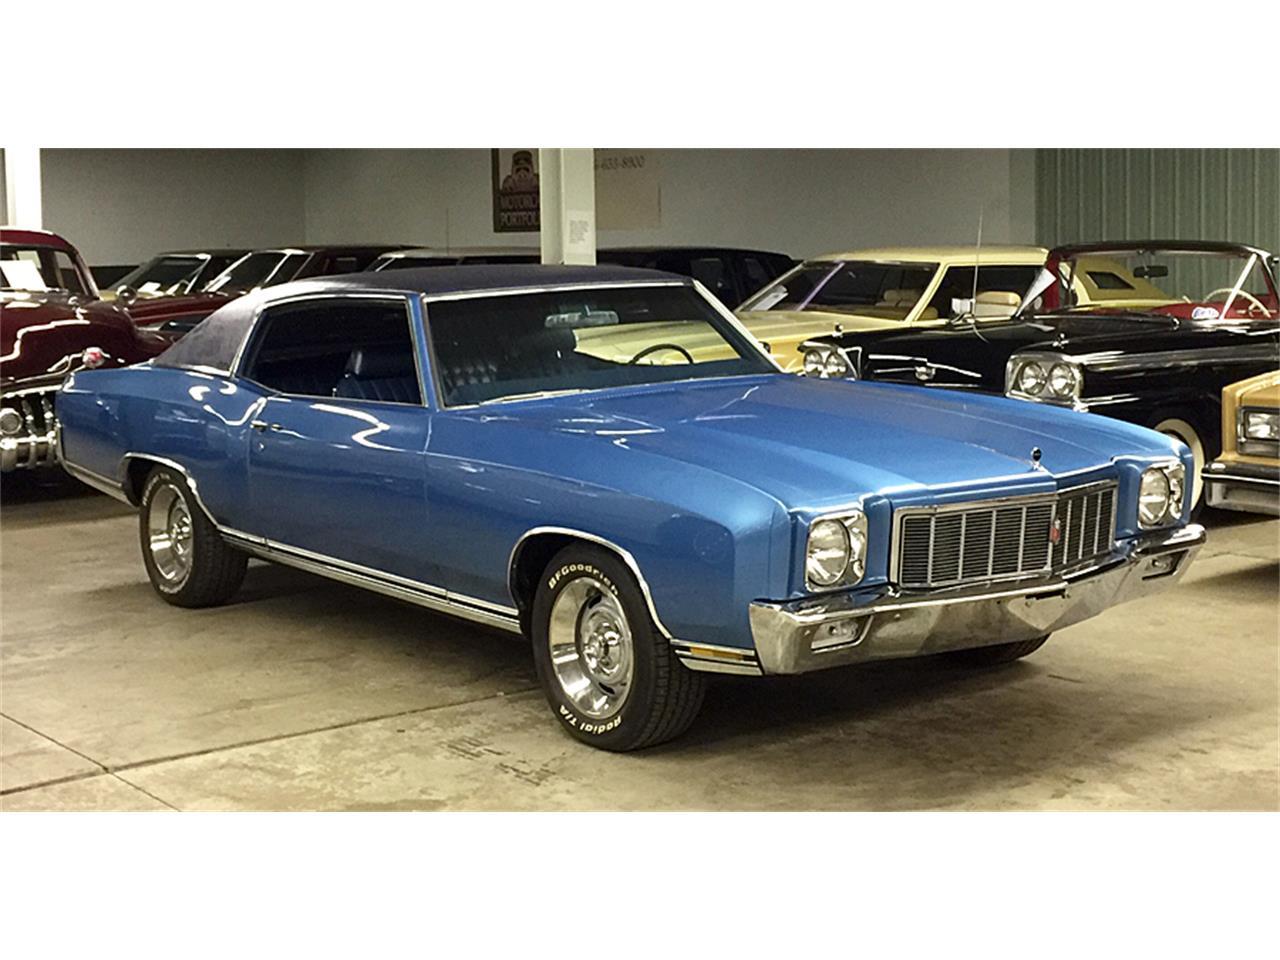 1971 Chevrolet Monte Carlo For Sale Classiccars Com Cc 1166690